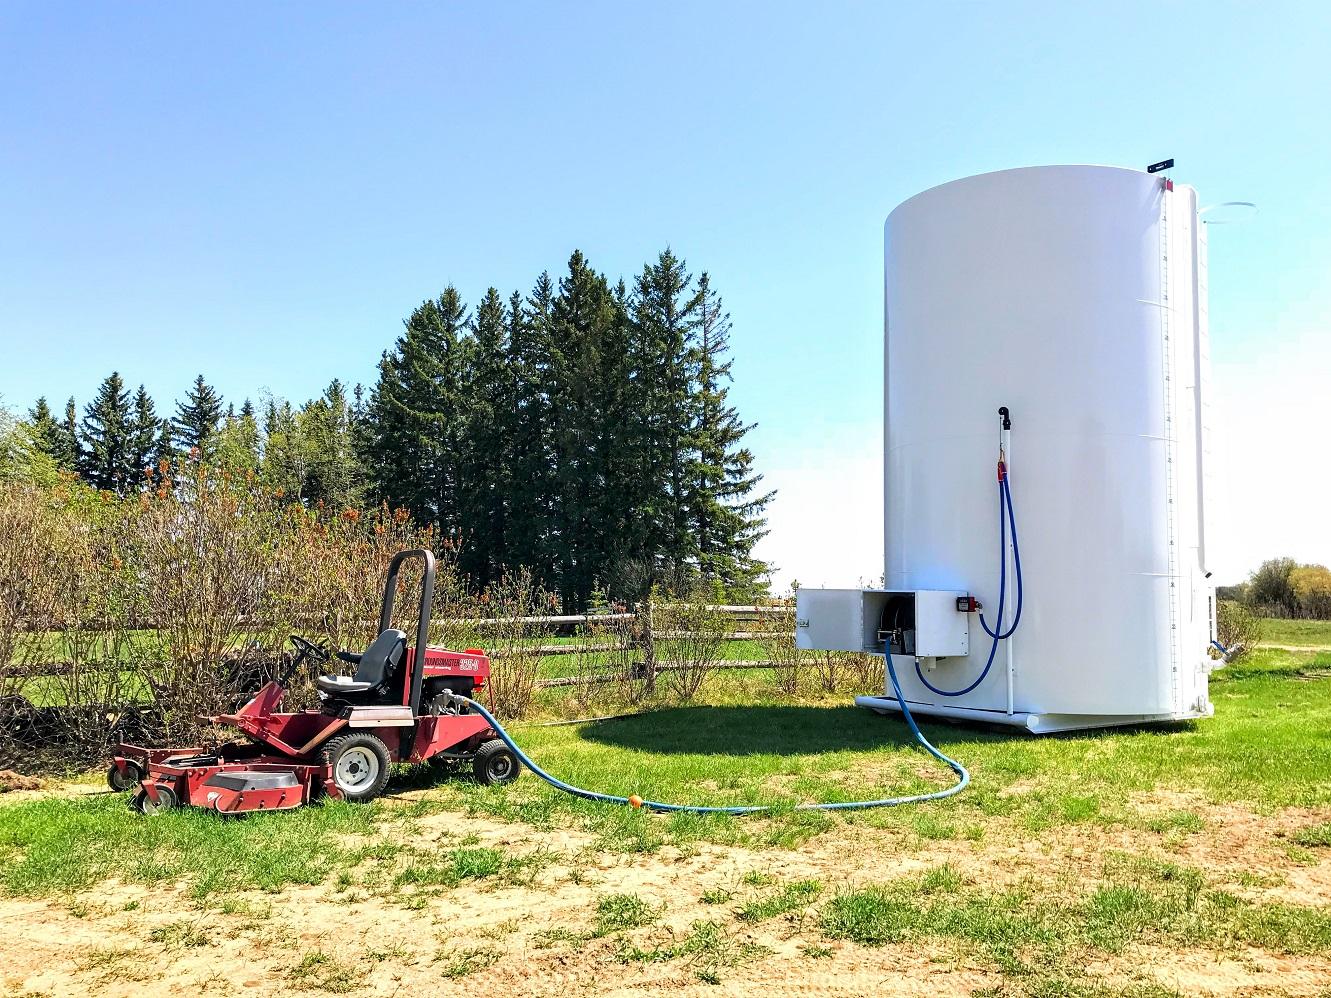 ulc on farm fuel tanks